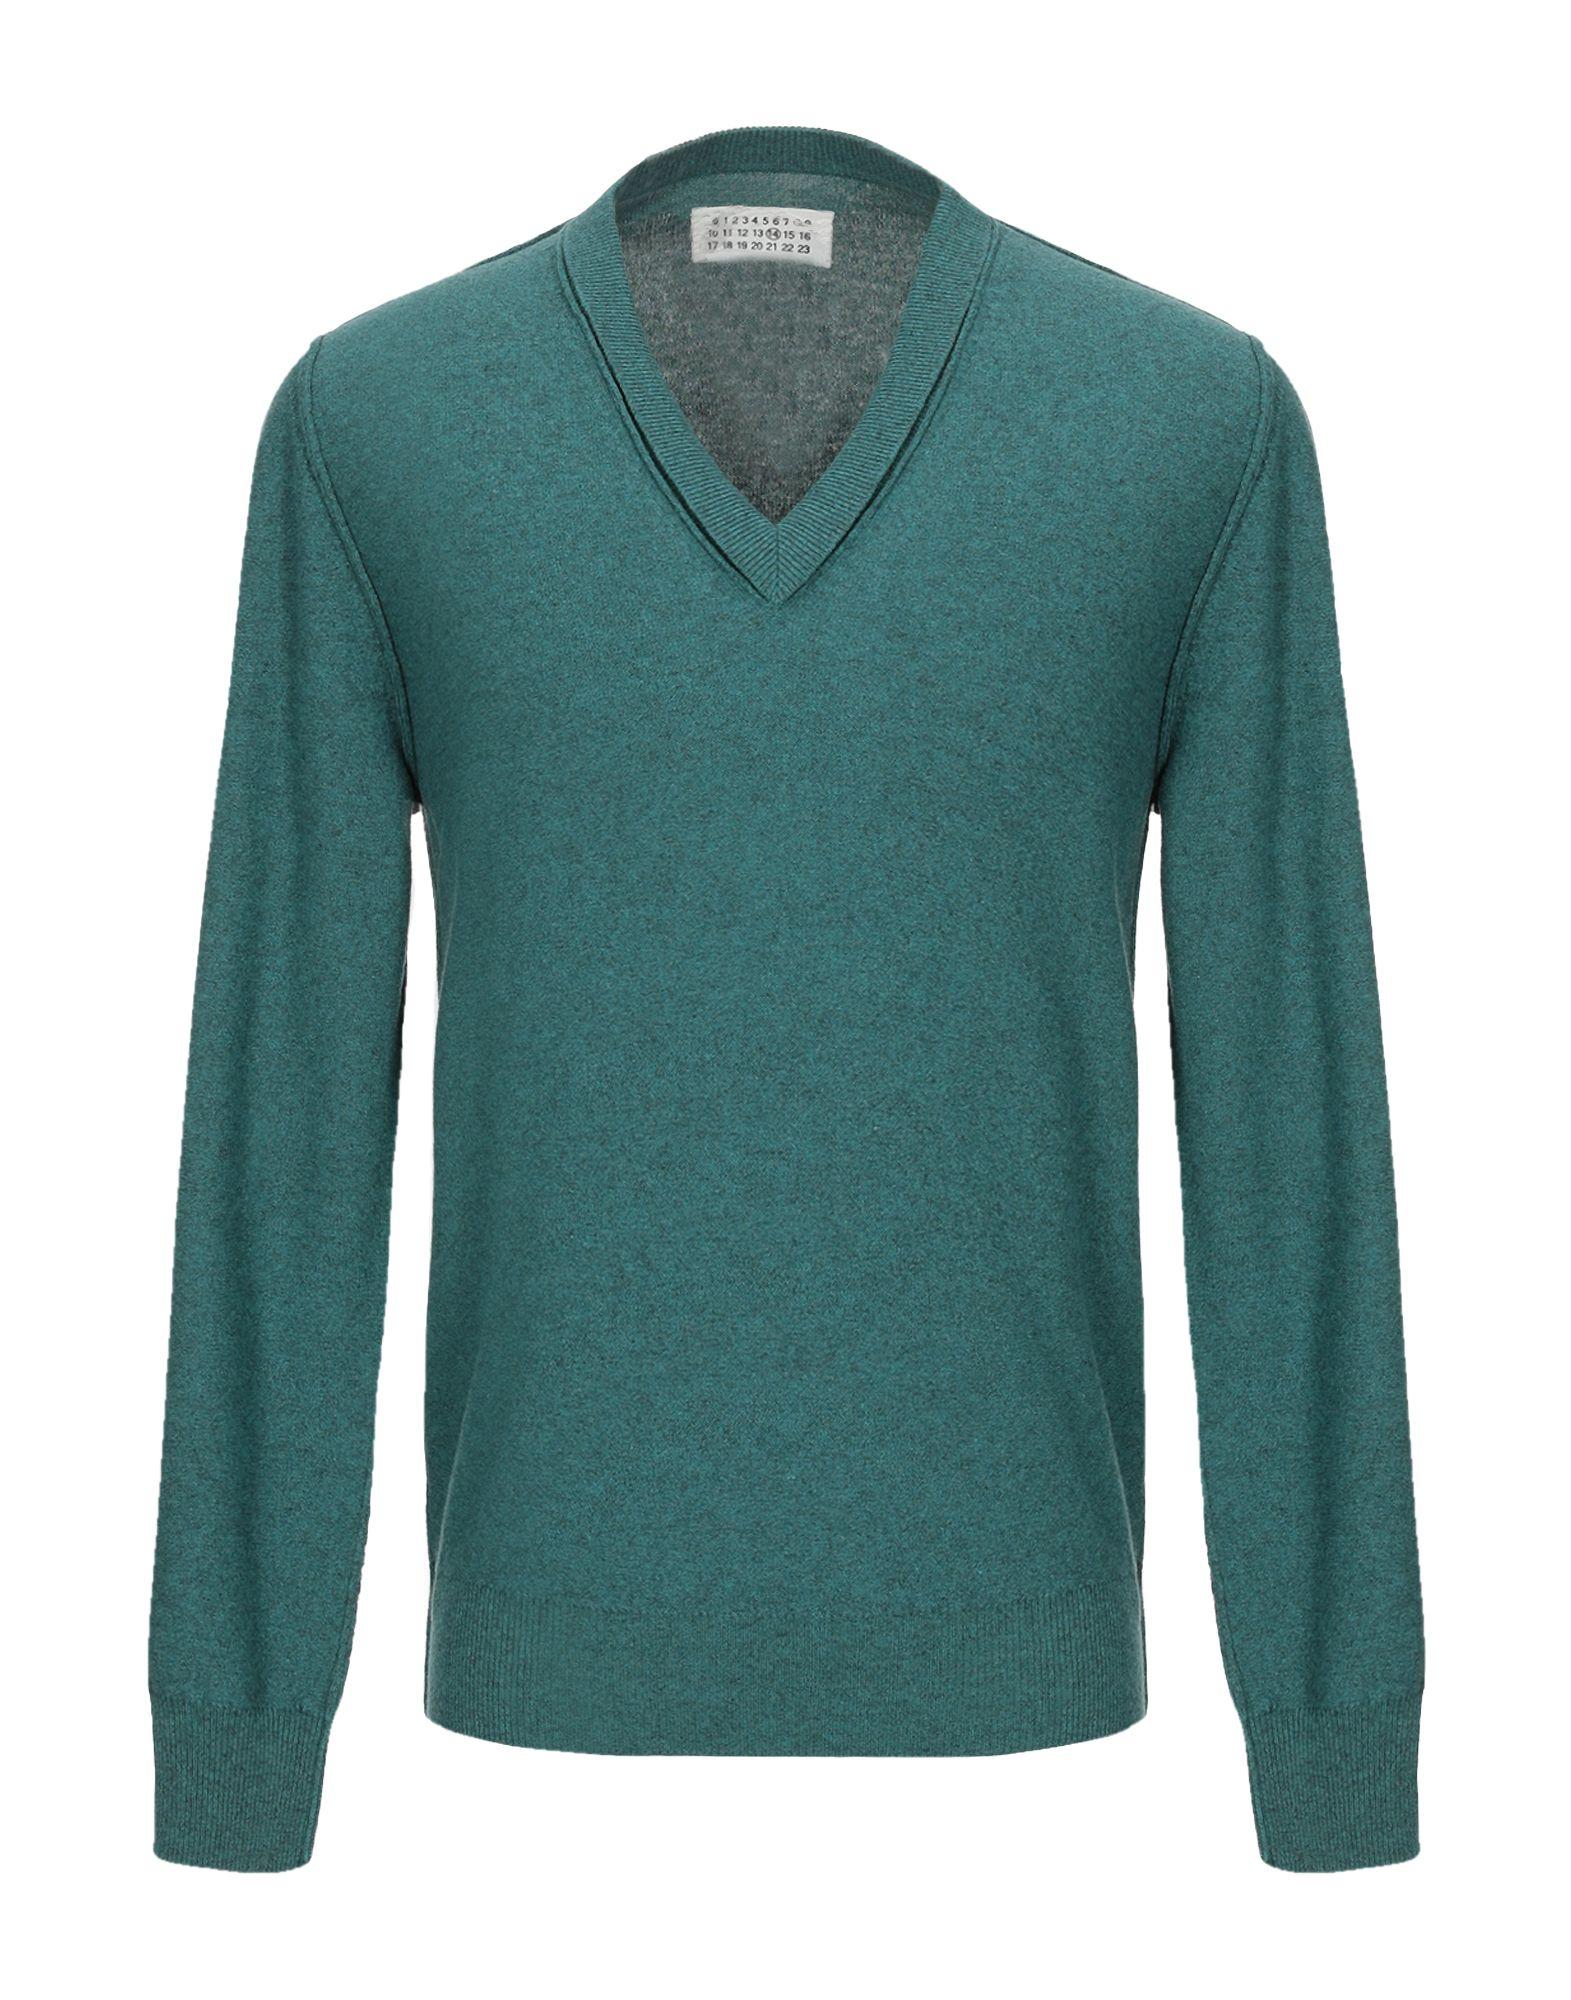 MAISON MARGIELA Свитер maison laviniaturra свитер